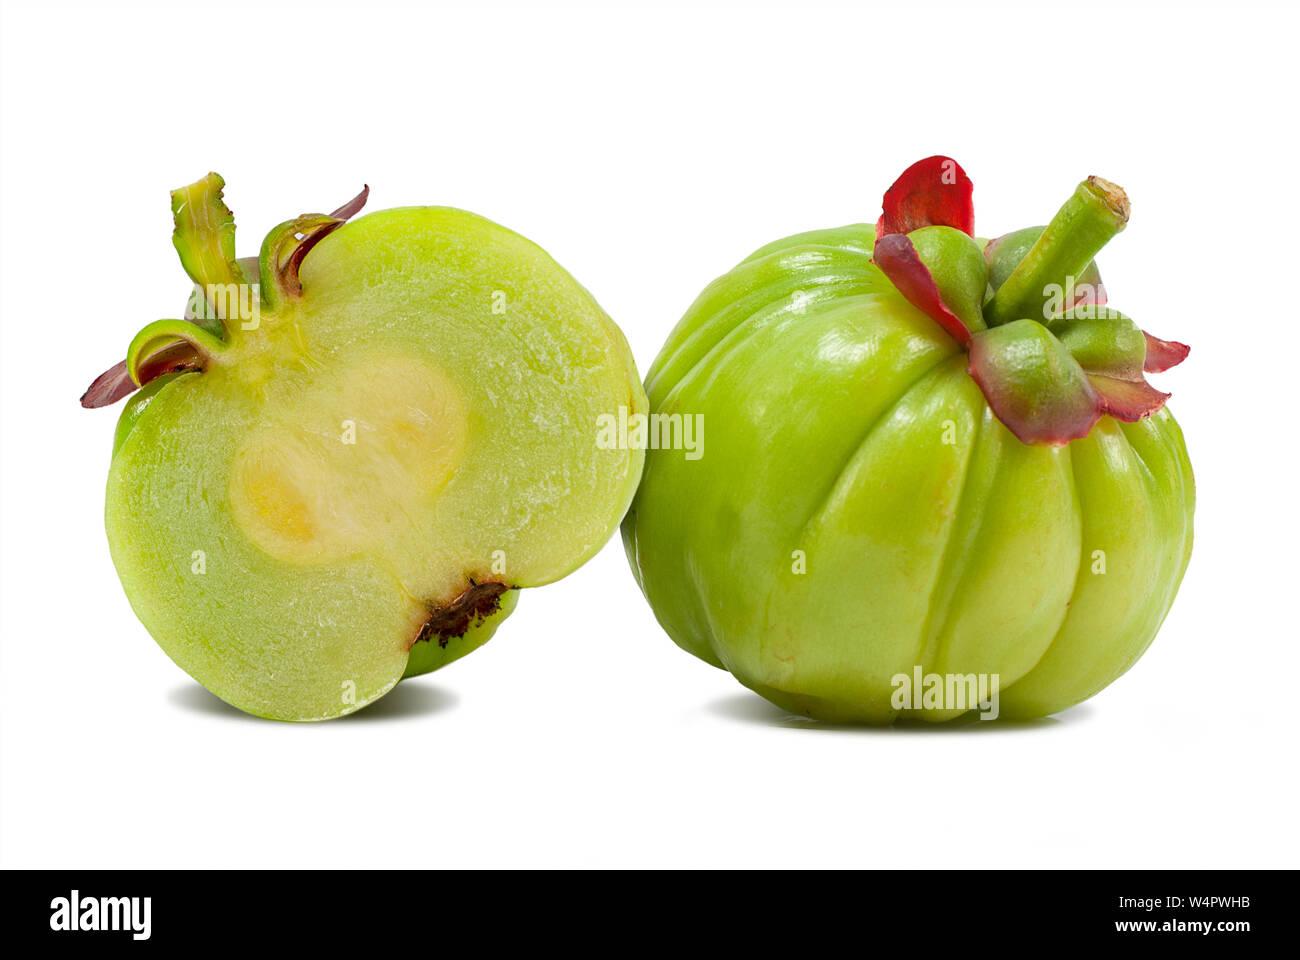 Garcinia Cambogia Fruit High Resolution Stock Photography And